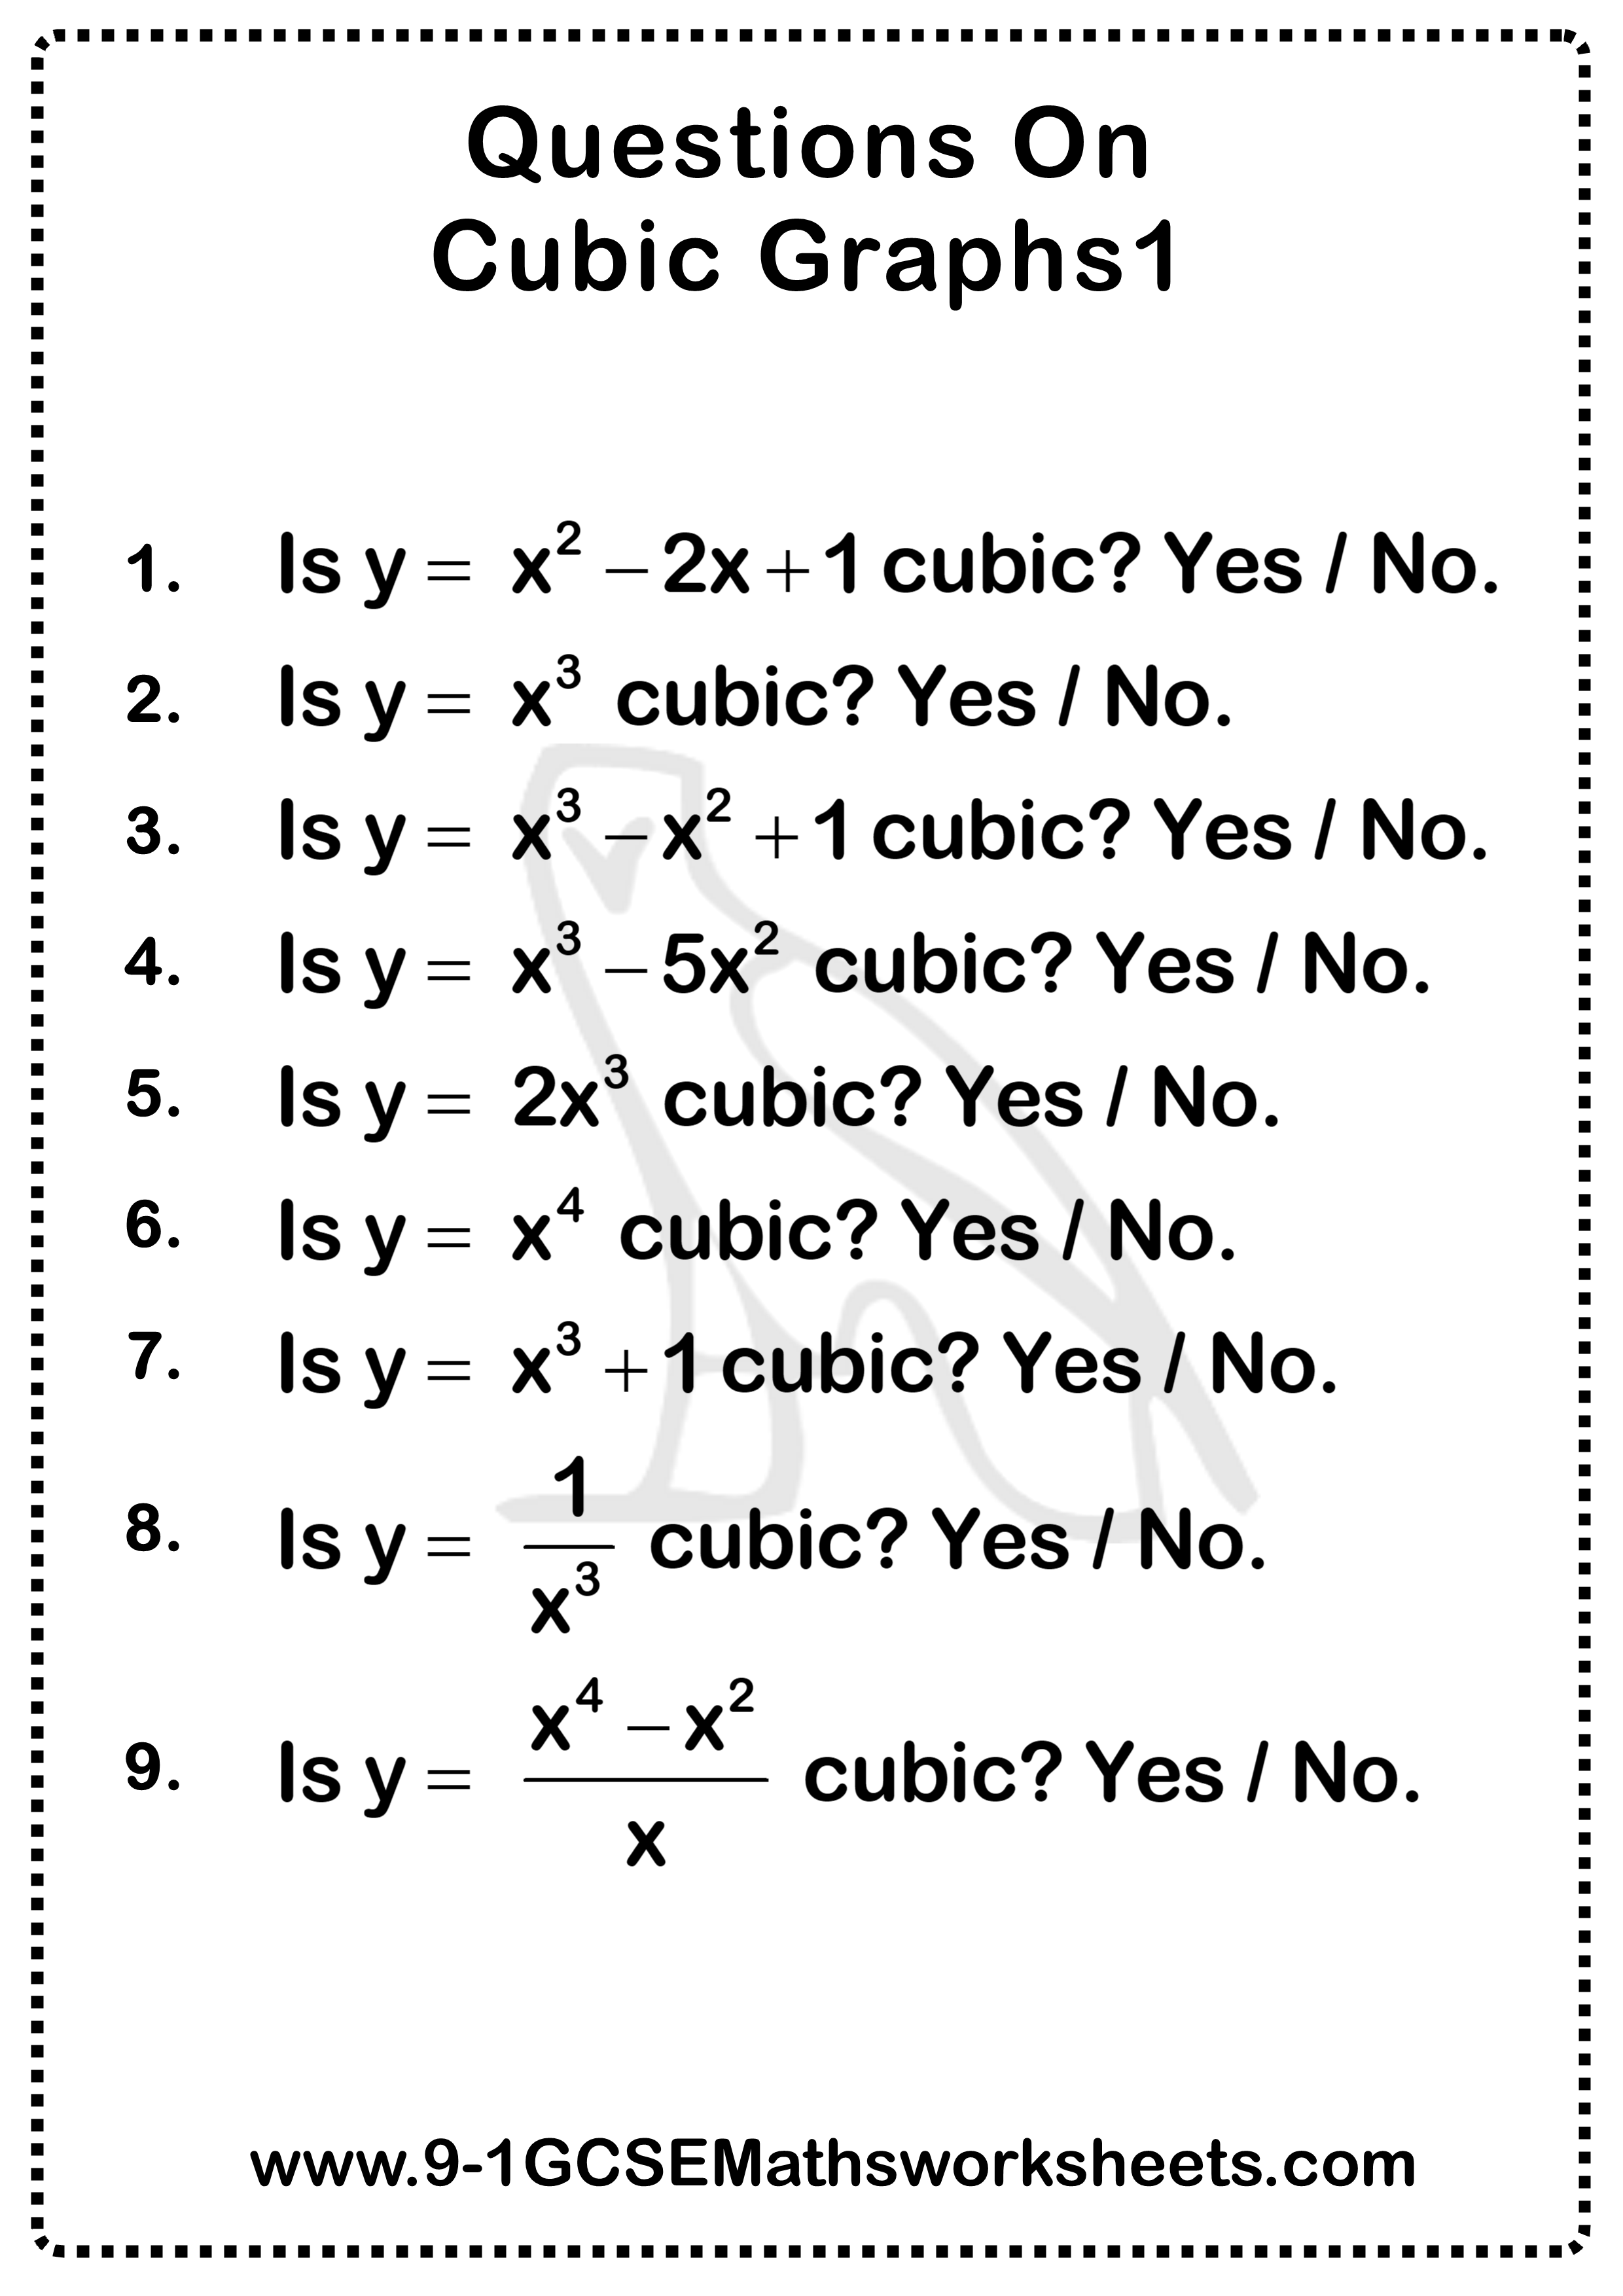 Cubic Graphs Worksheet 1